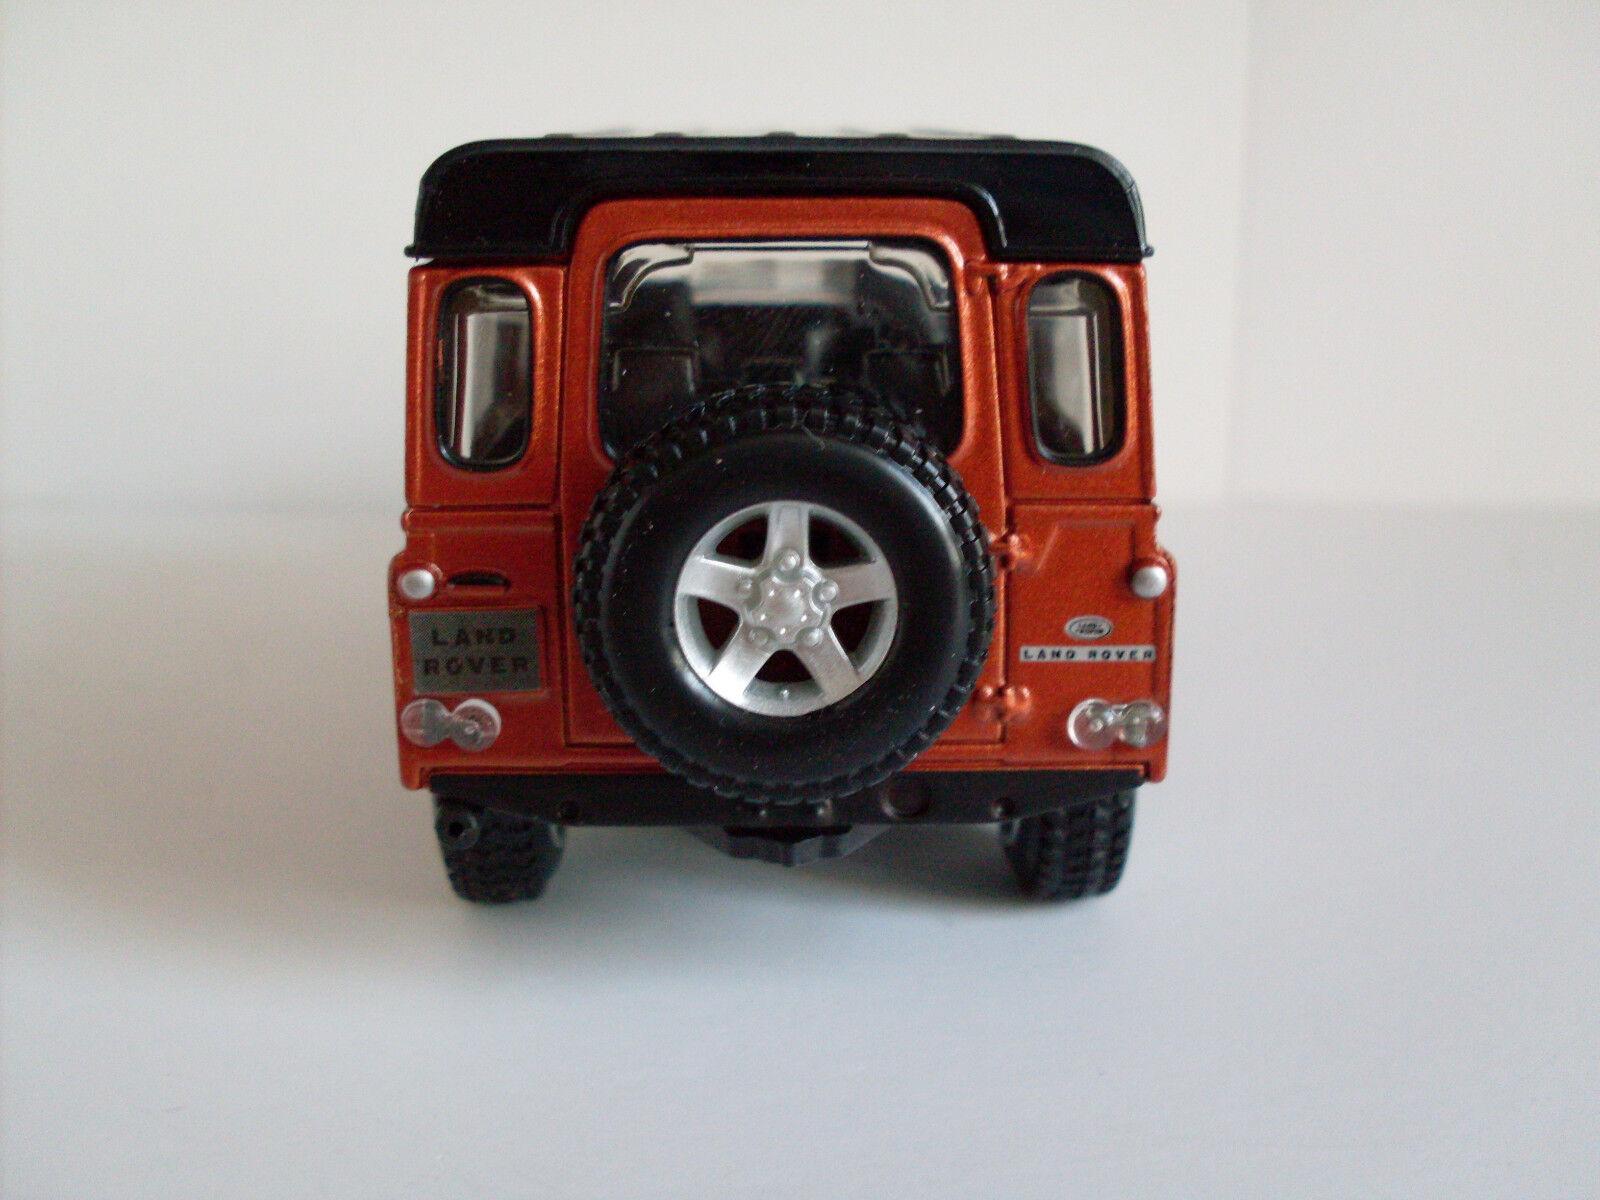 Bburago Street Fire 1:32 Neu OVP Land Rover Defender 110 kupfer metallic